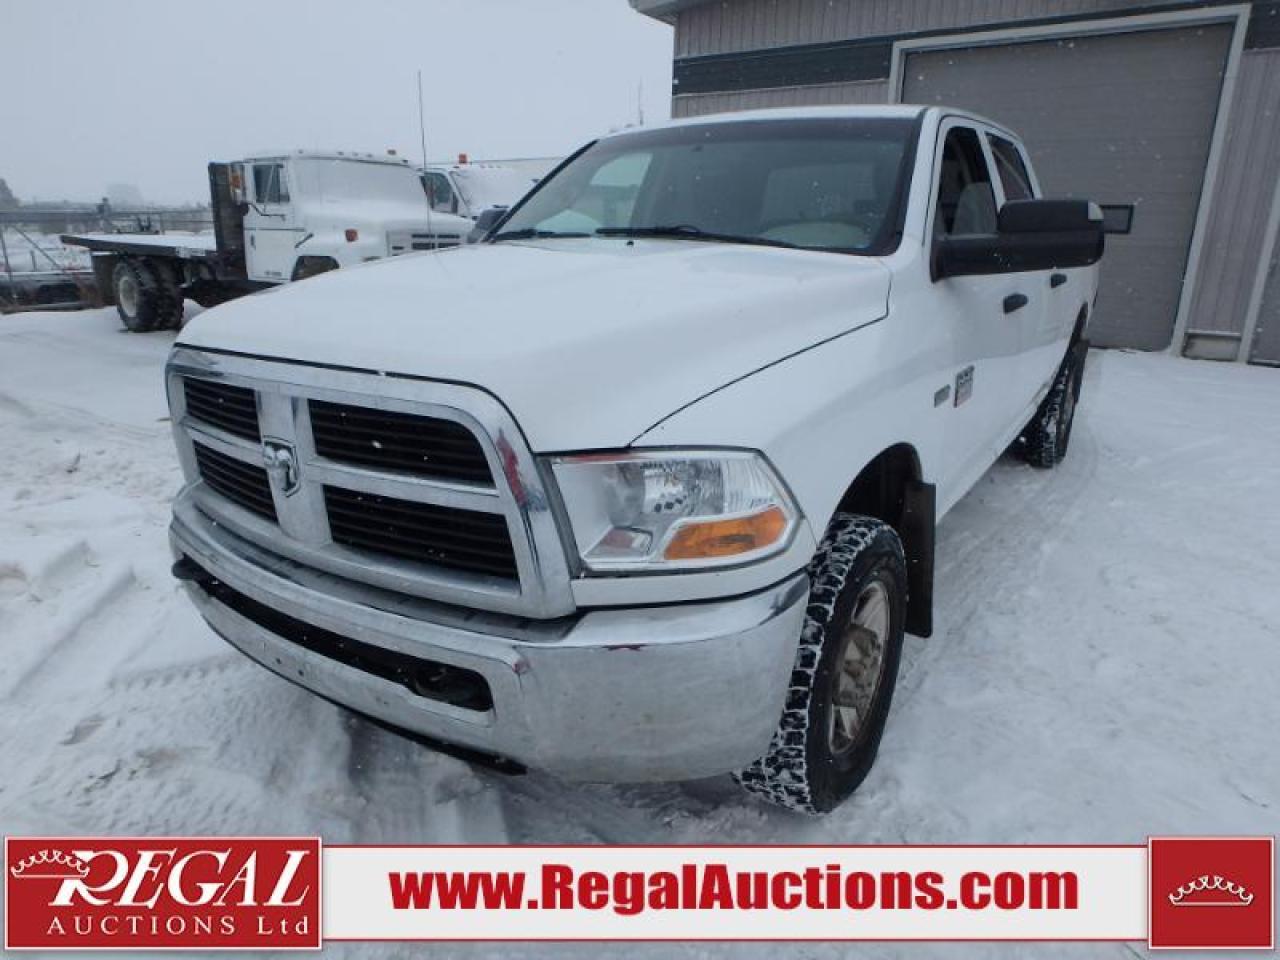 Photo of White 2011 Dodge Ram 2500